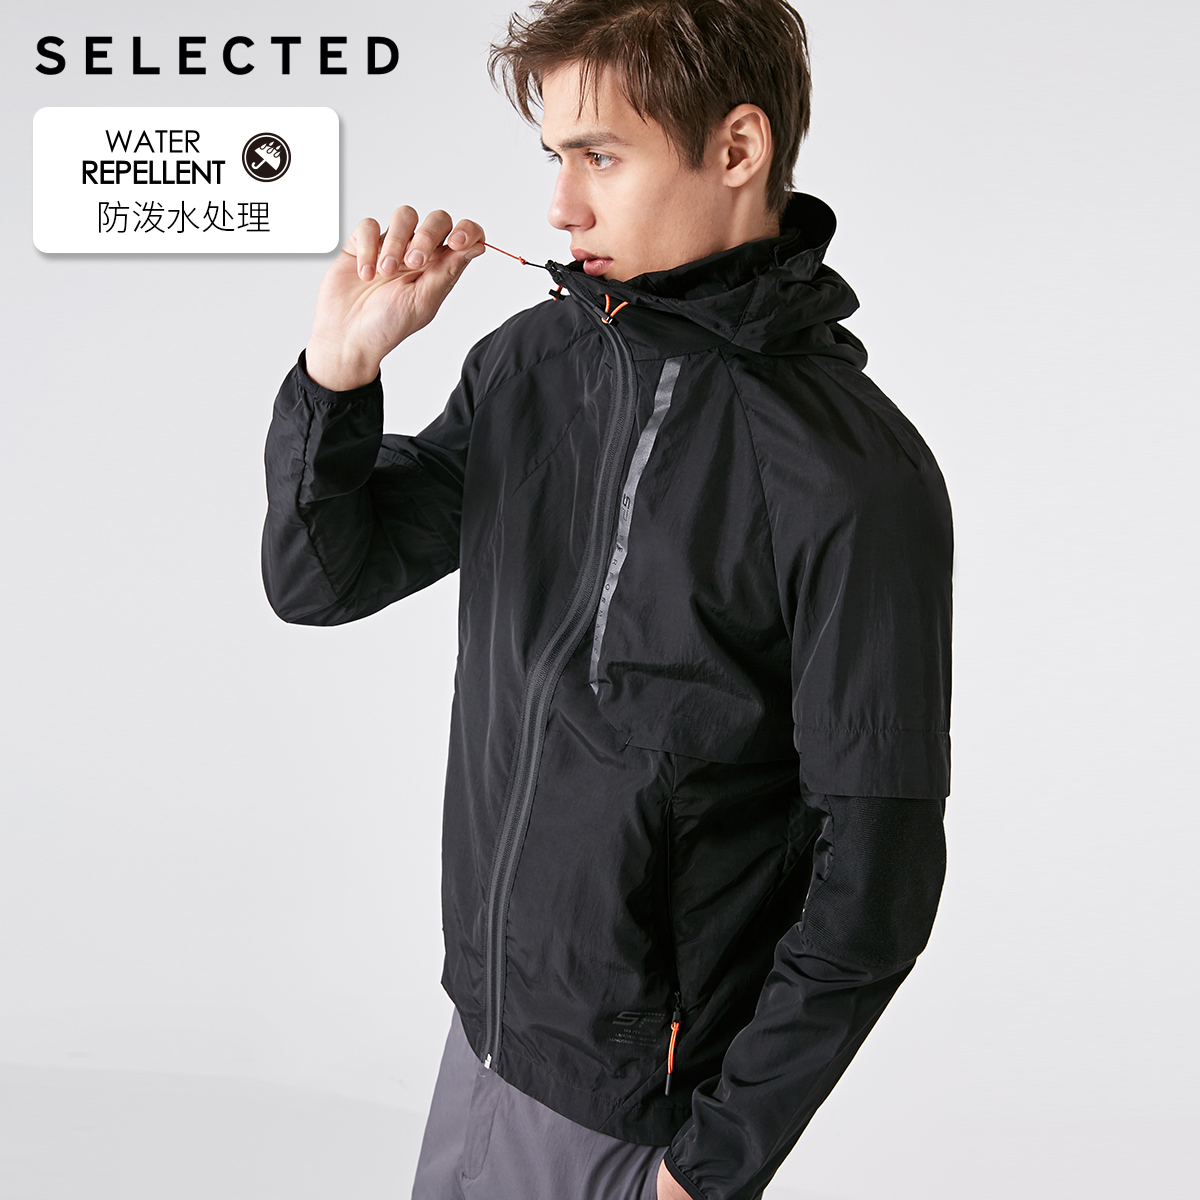 SELECTED Men's Spring Hooded Waterproof Lightweight Casual Jacket S|419121524